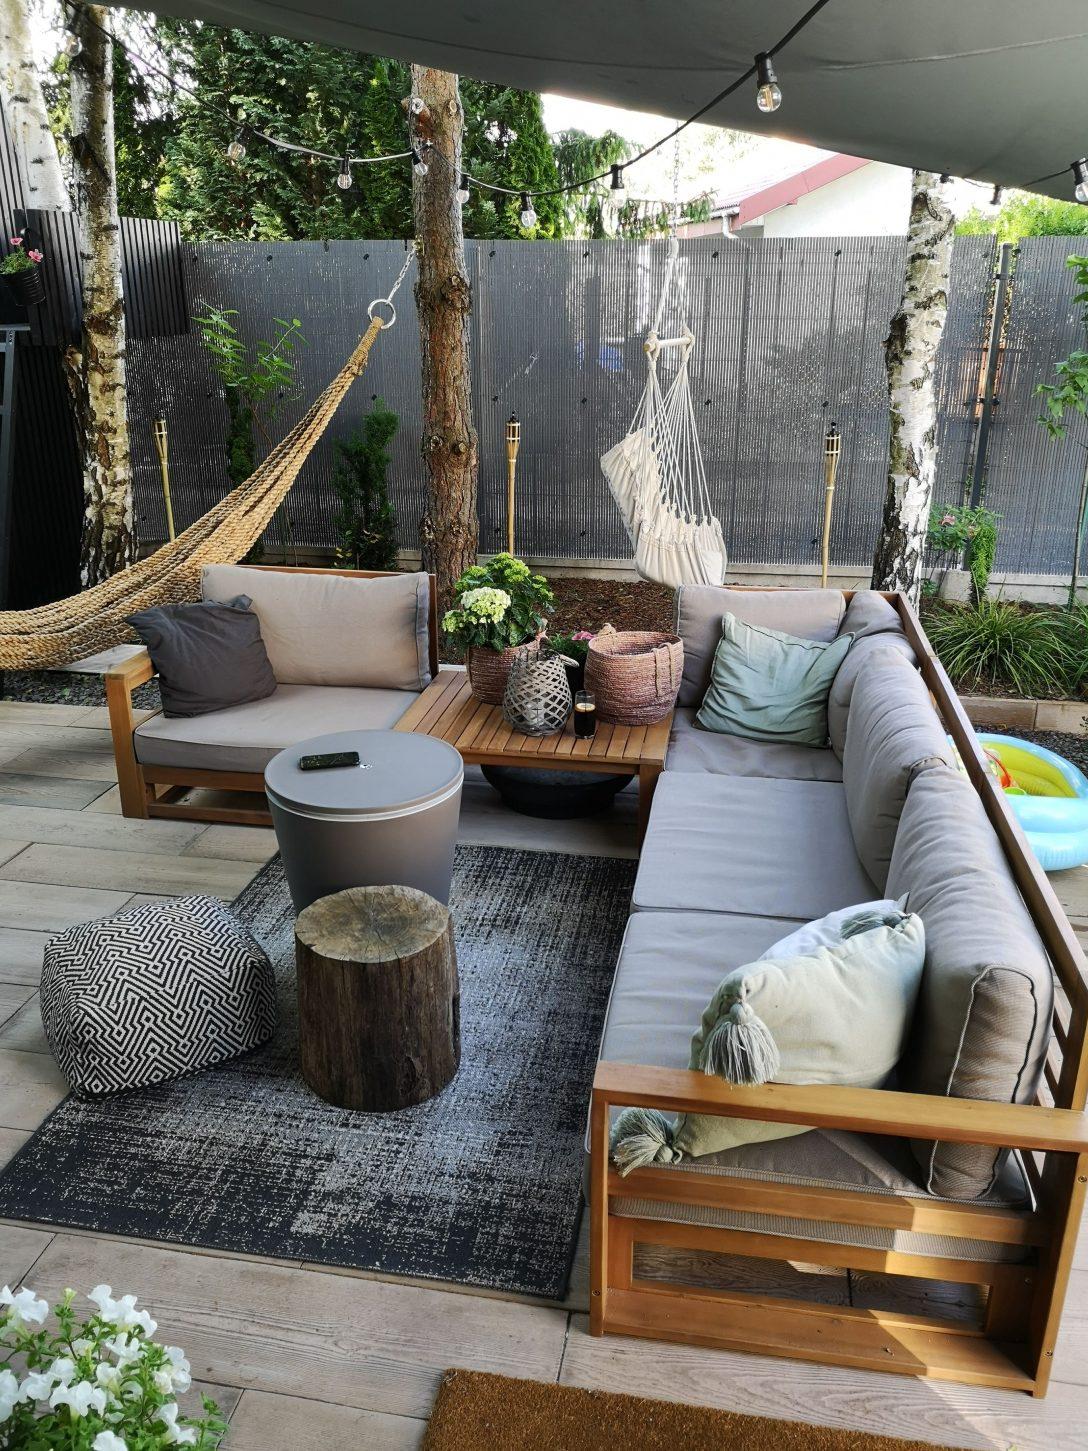 Large Size of Loungeecke Garten Lounge Set Zertifiziertes Holz Braun Timor Kugelleuchten Liegestuhl Ausziehtisch Pavillon Spaten Feuerschale Kinderhaus Spielhaus Möbel Wohnzimmer Loungeecke Garten